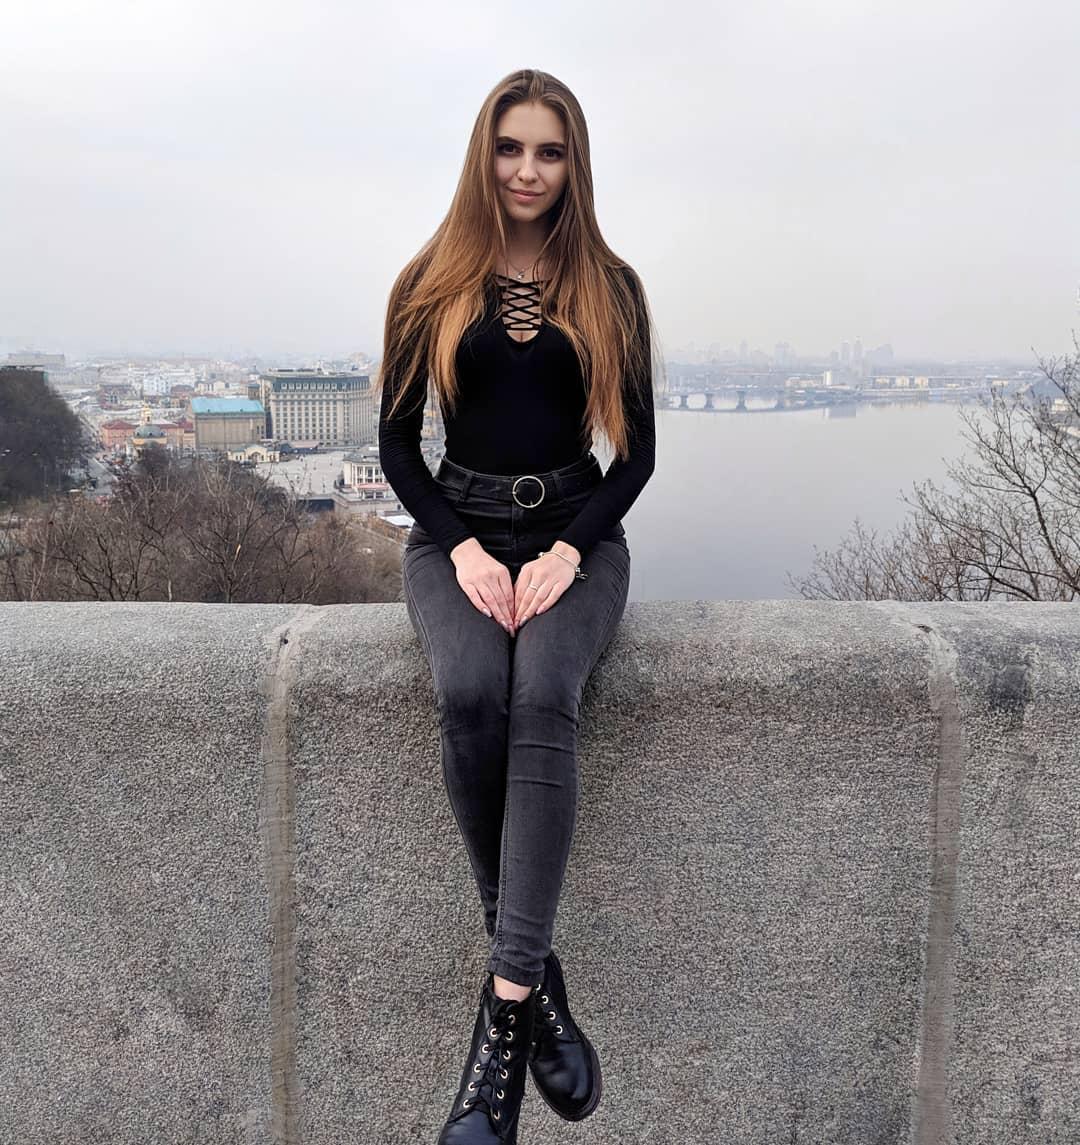 Katya-Melnyk-Wallpapers-Insta-Biography-3